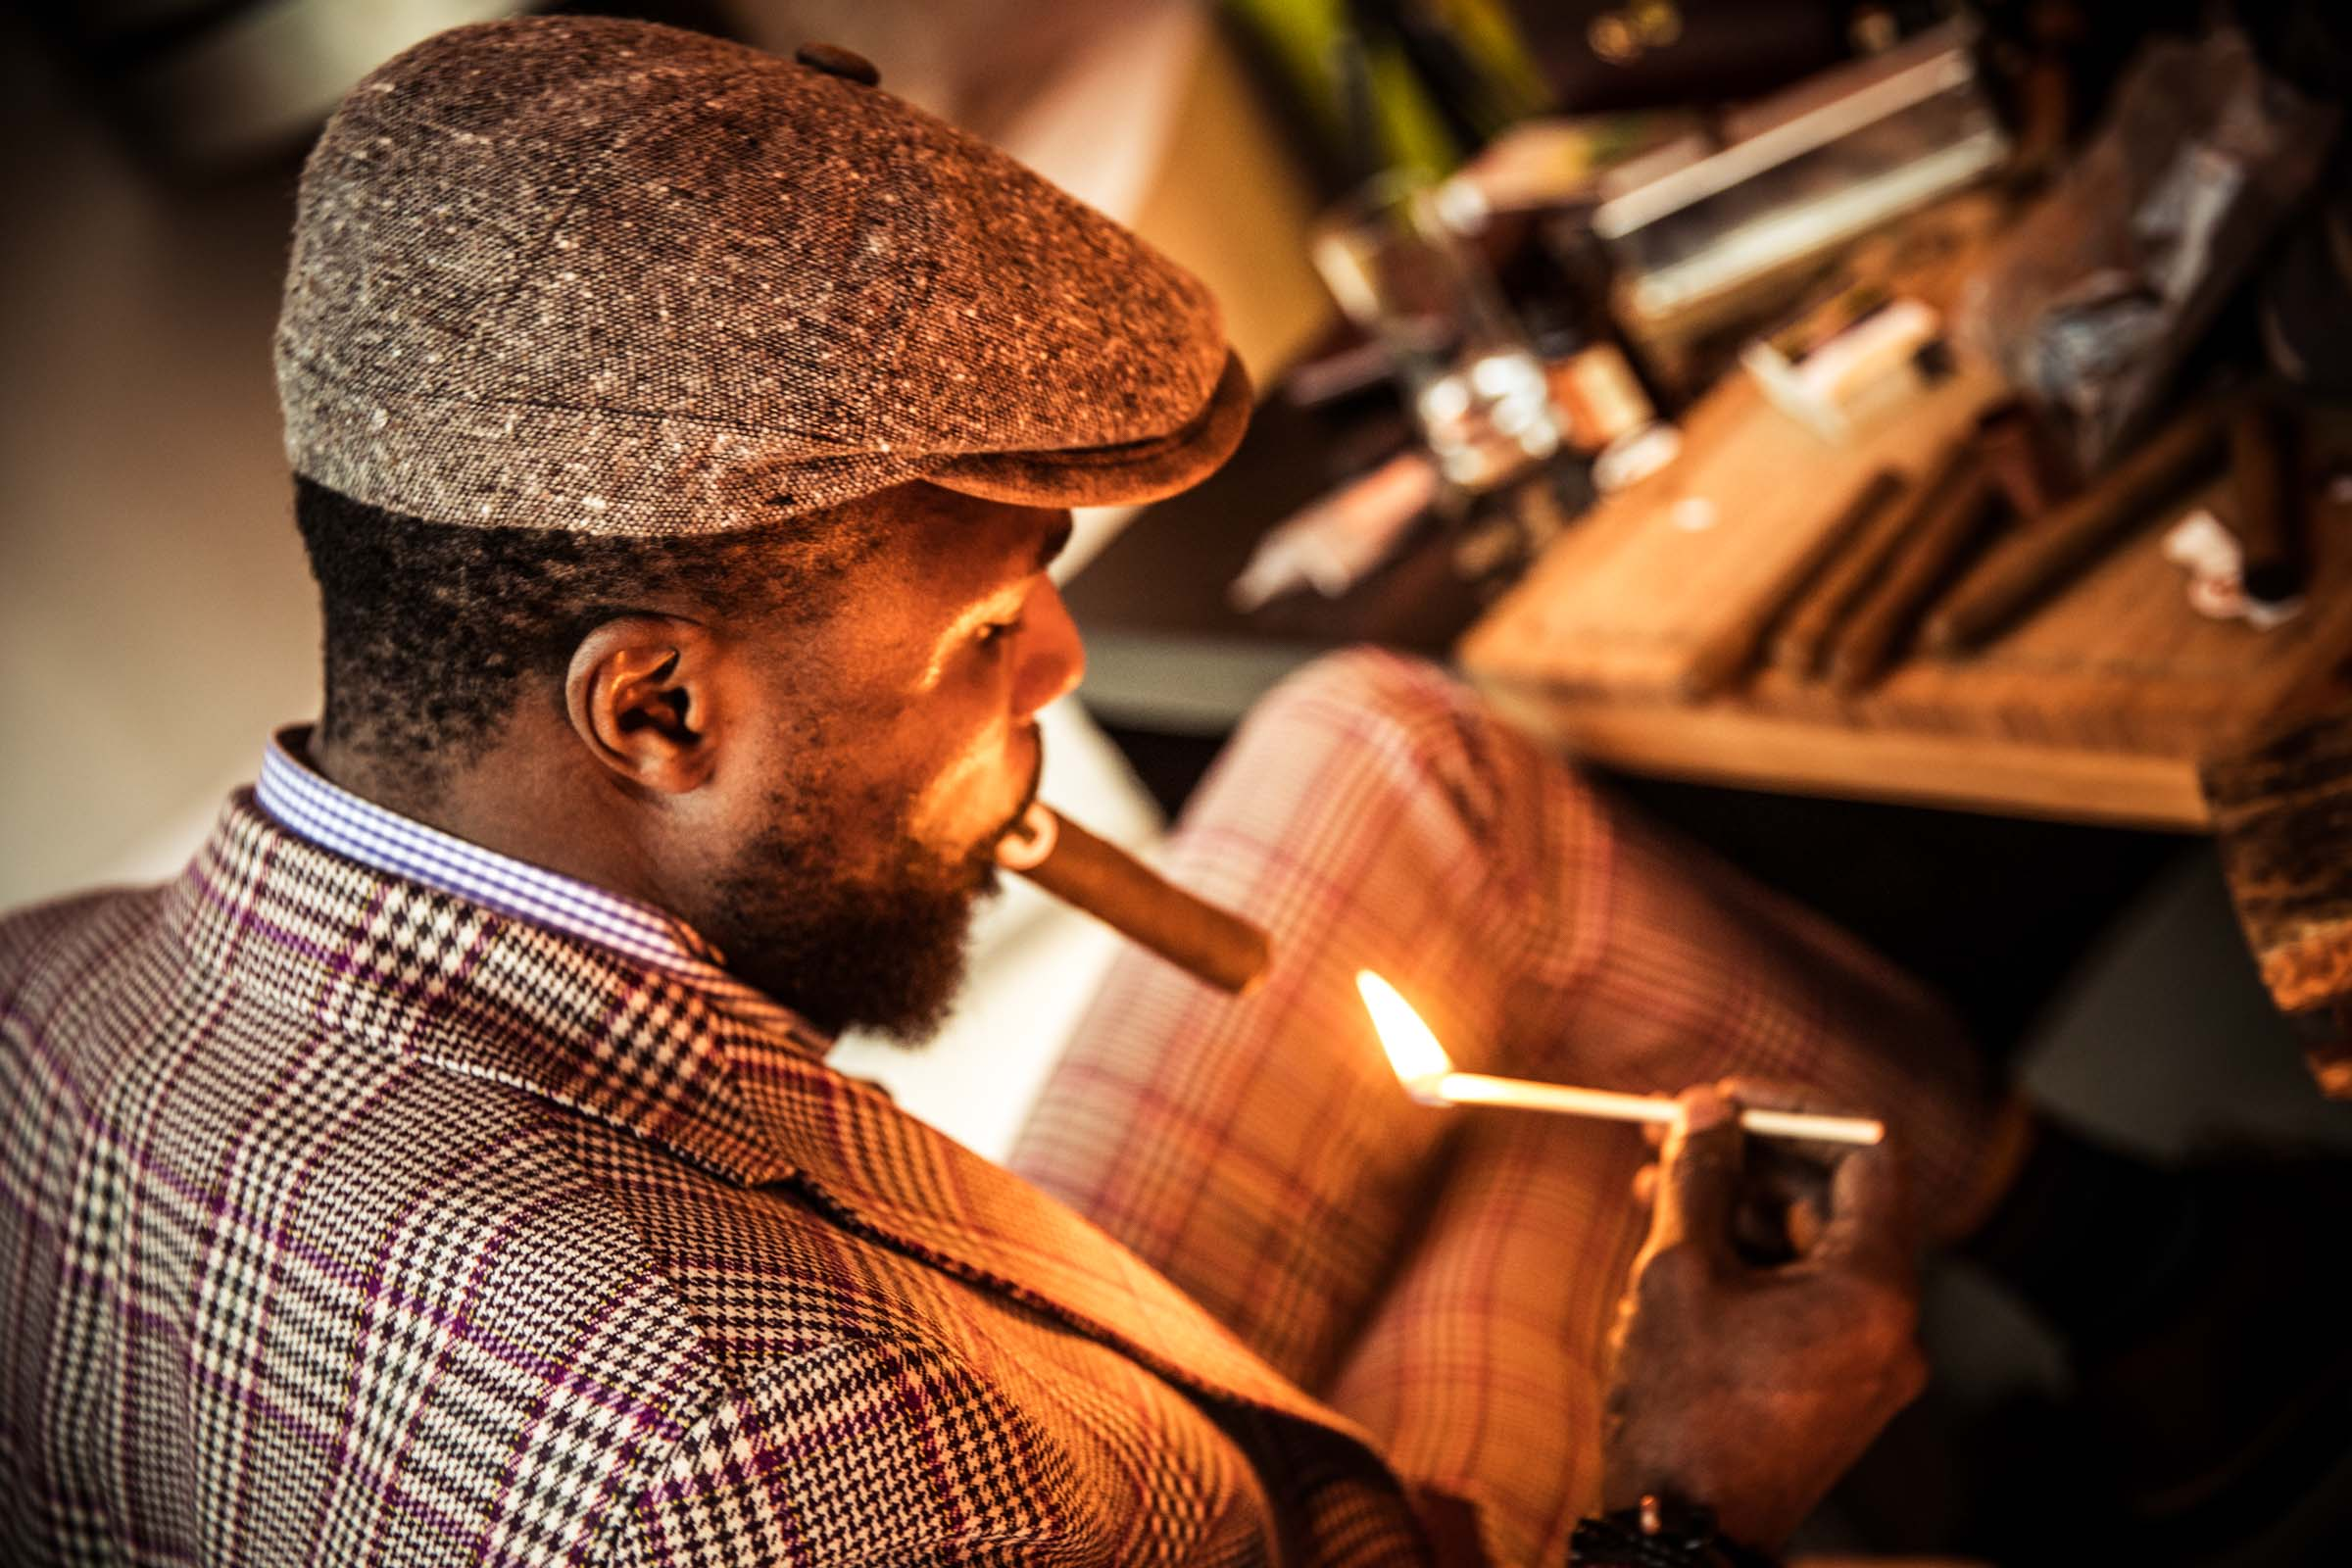 Zigarrenroller |Zigarrendreher |Zigarre |Handgefertigt |Event |Gala |Hochzeit |Messe |Buchen |Mieten